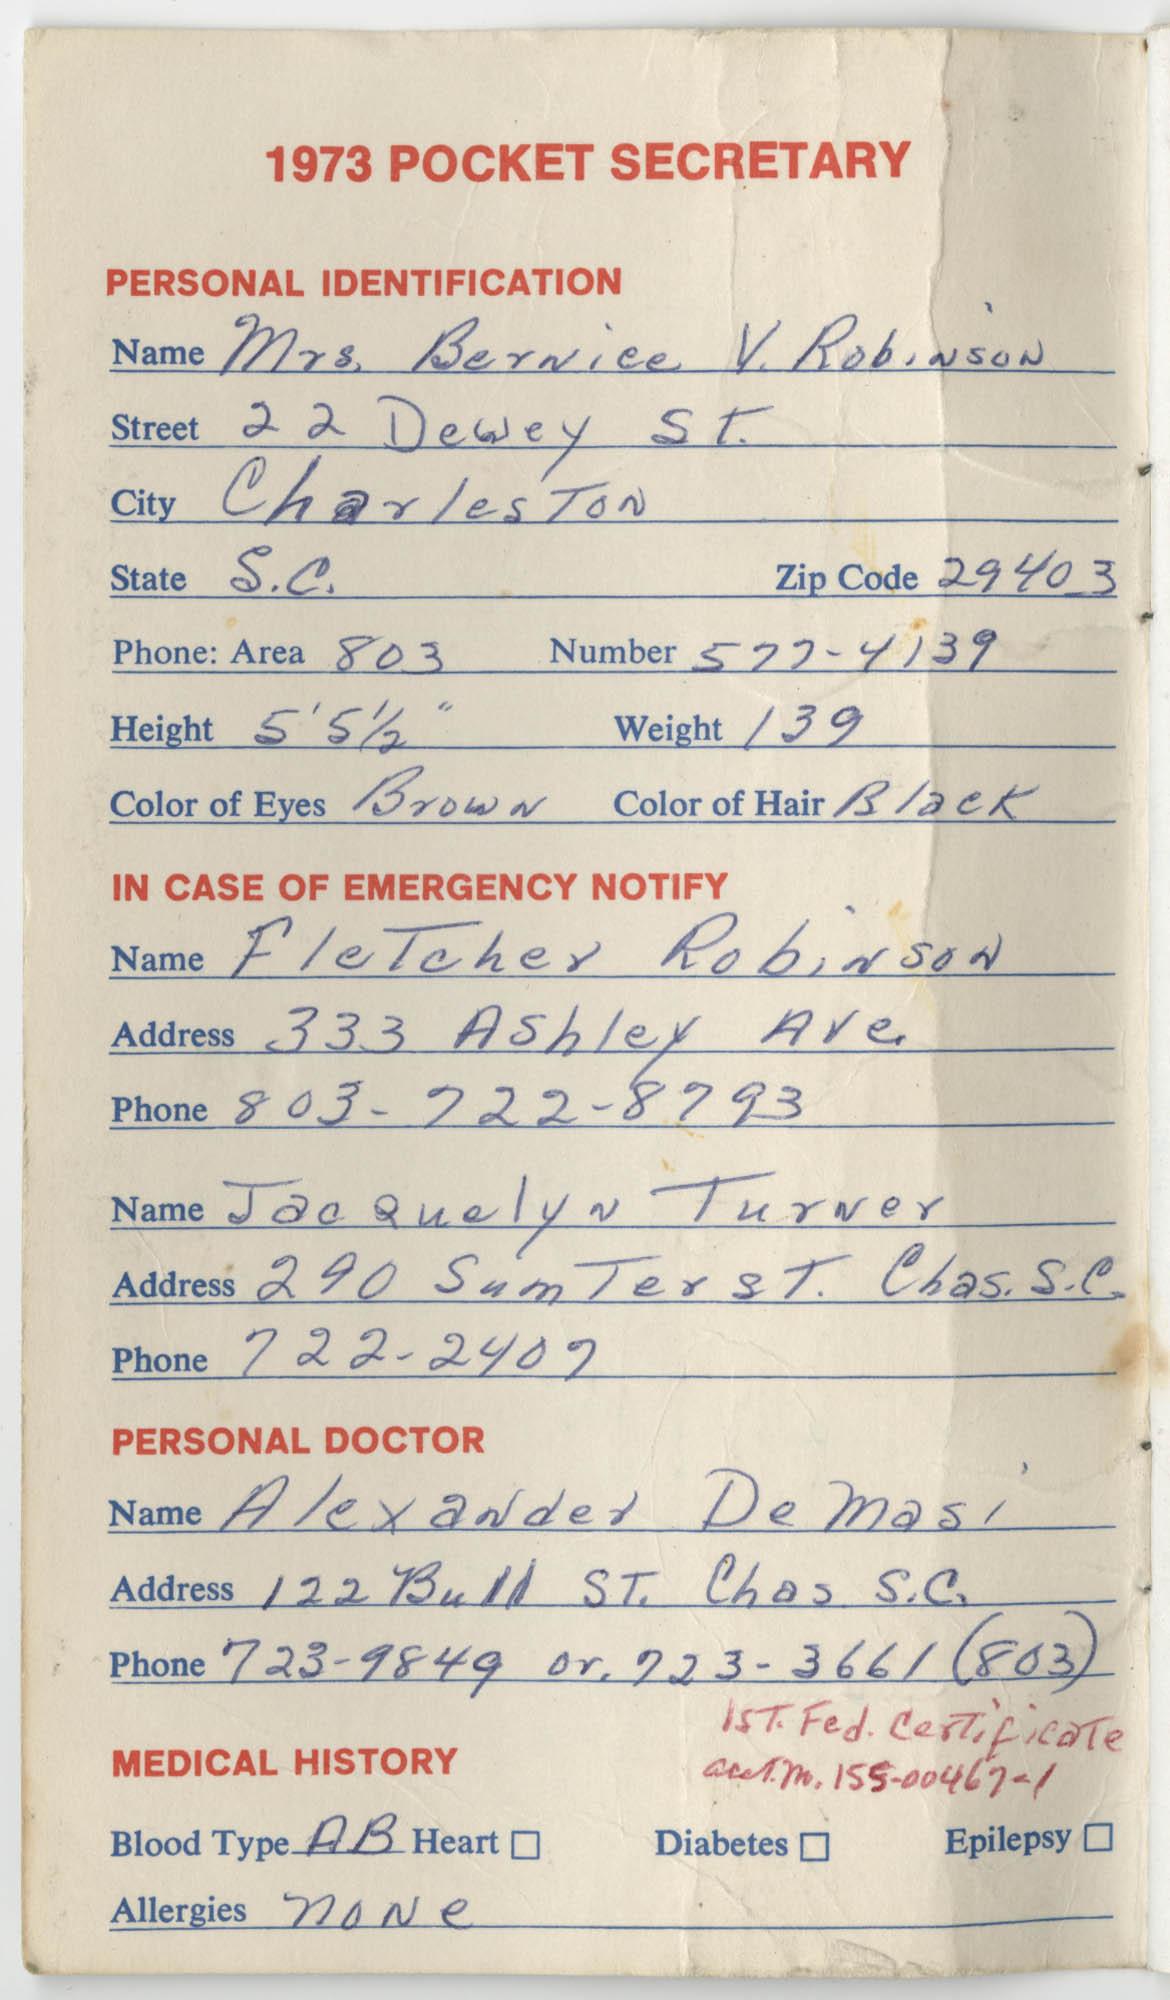 Bernice Robinson's 1973 Pocket Secretary, Personal Information